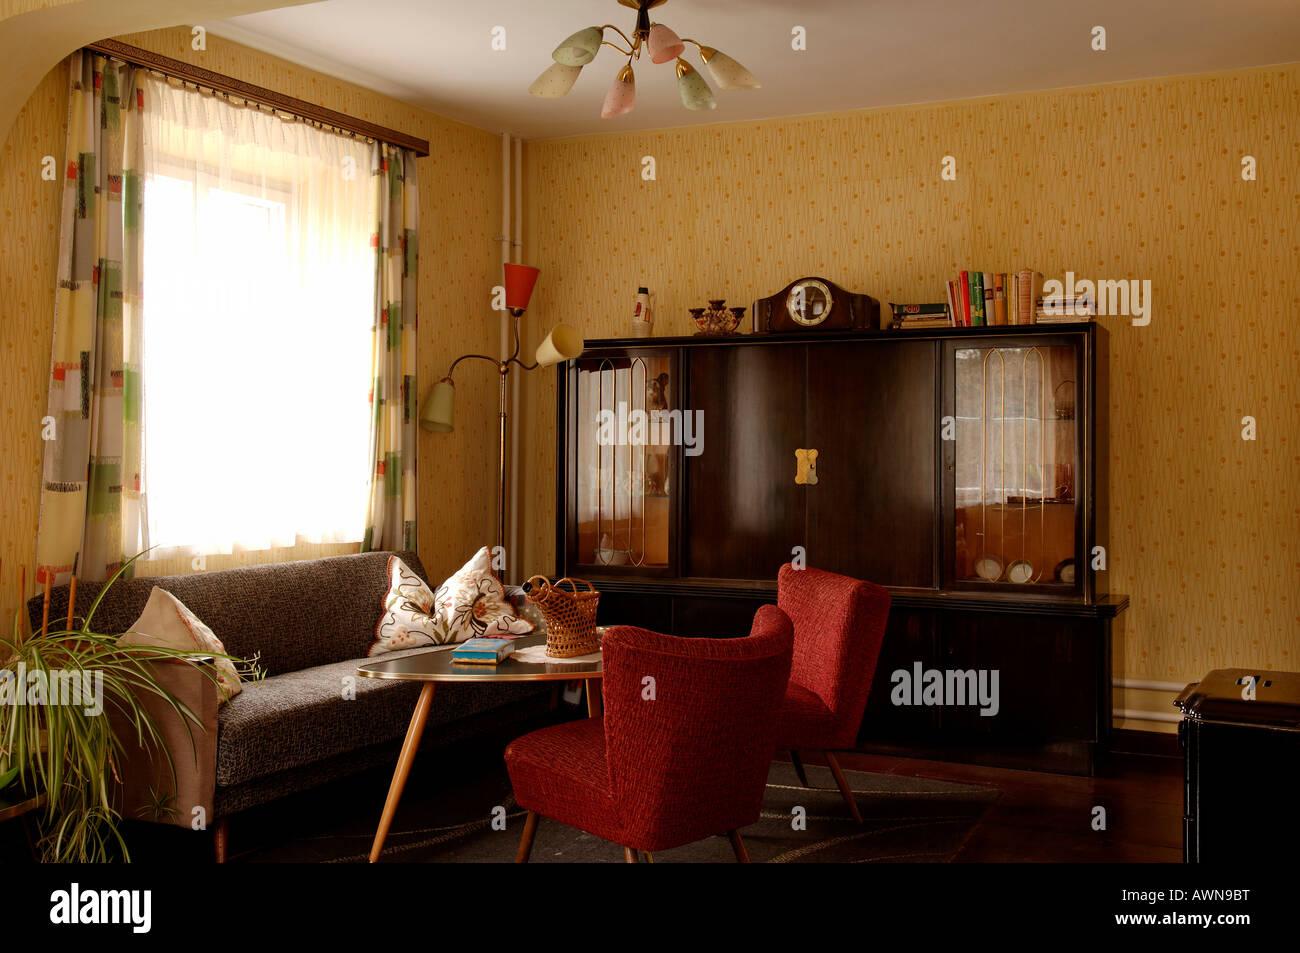 1950s Living Room Stock Photos Amp 1950s Living Room Stock